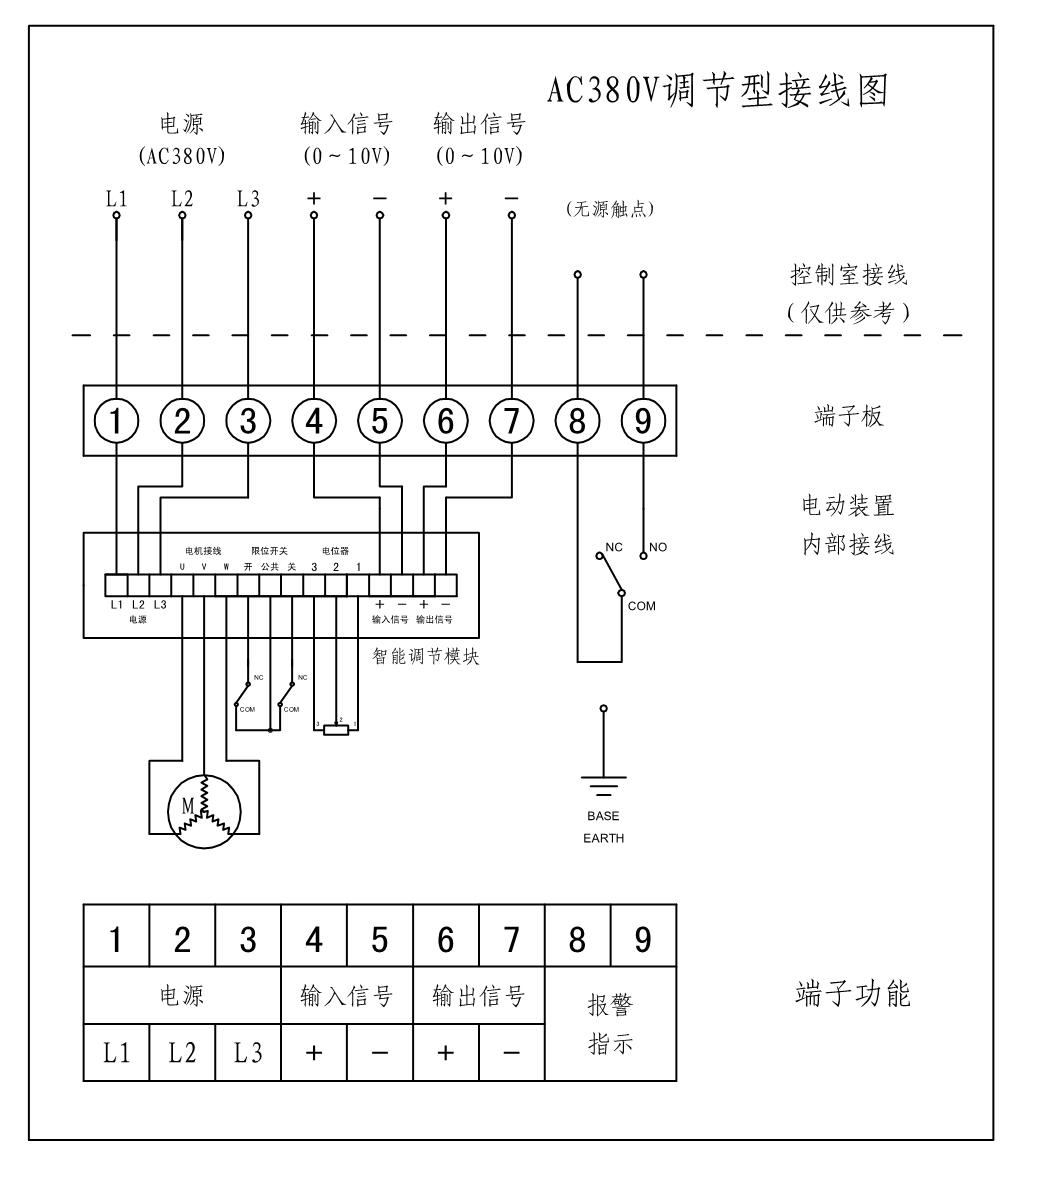 AC380V电动球阀接线图说明及控制方式